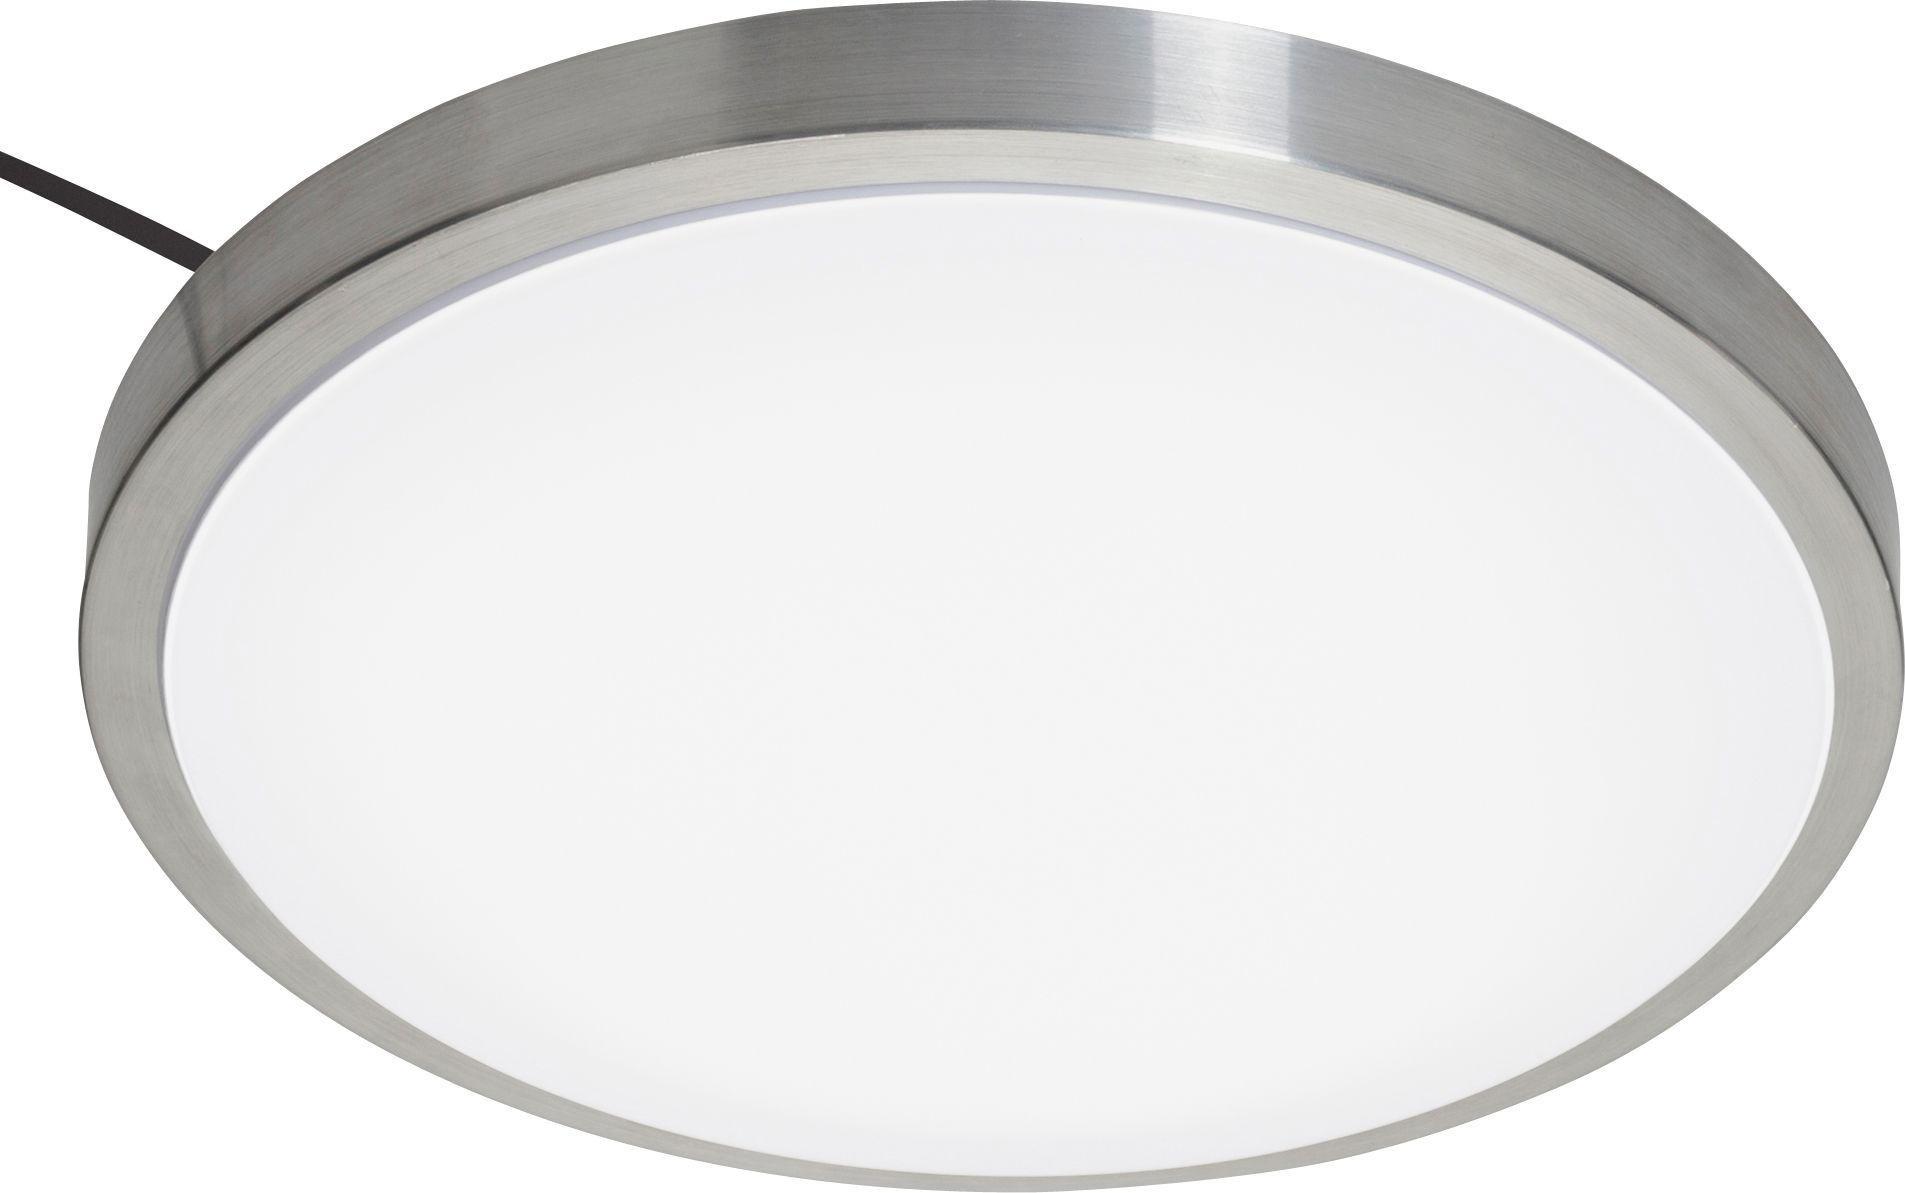 Collection Lido LED Bathroom Flush Ceiling Fitting - Chrome  sc 1 st  Argos & Ceiling and wall lights | Argos azcodes.com